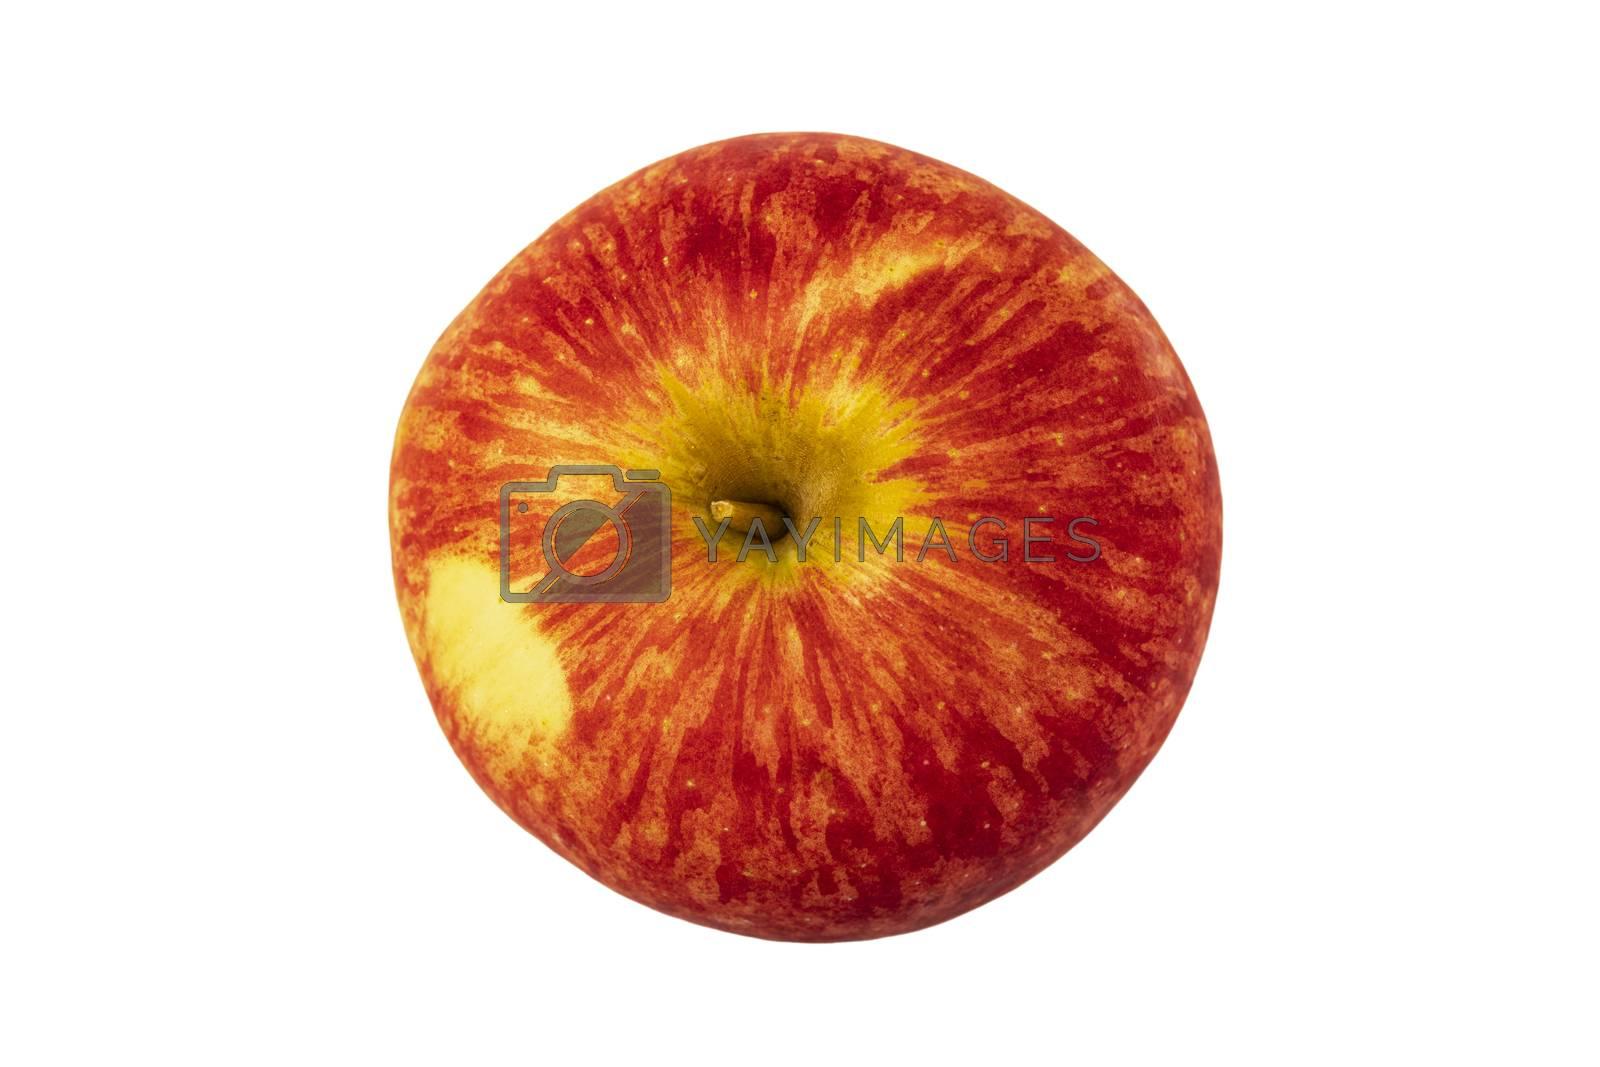 Closeup of gala apple on white background.